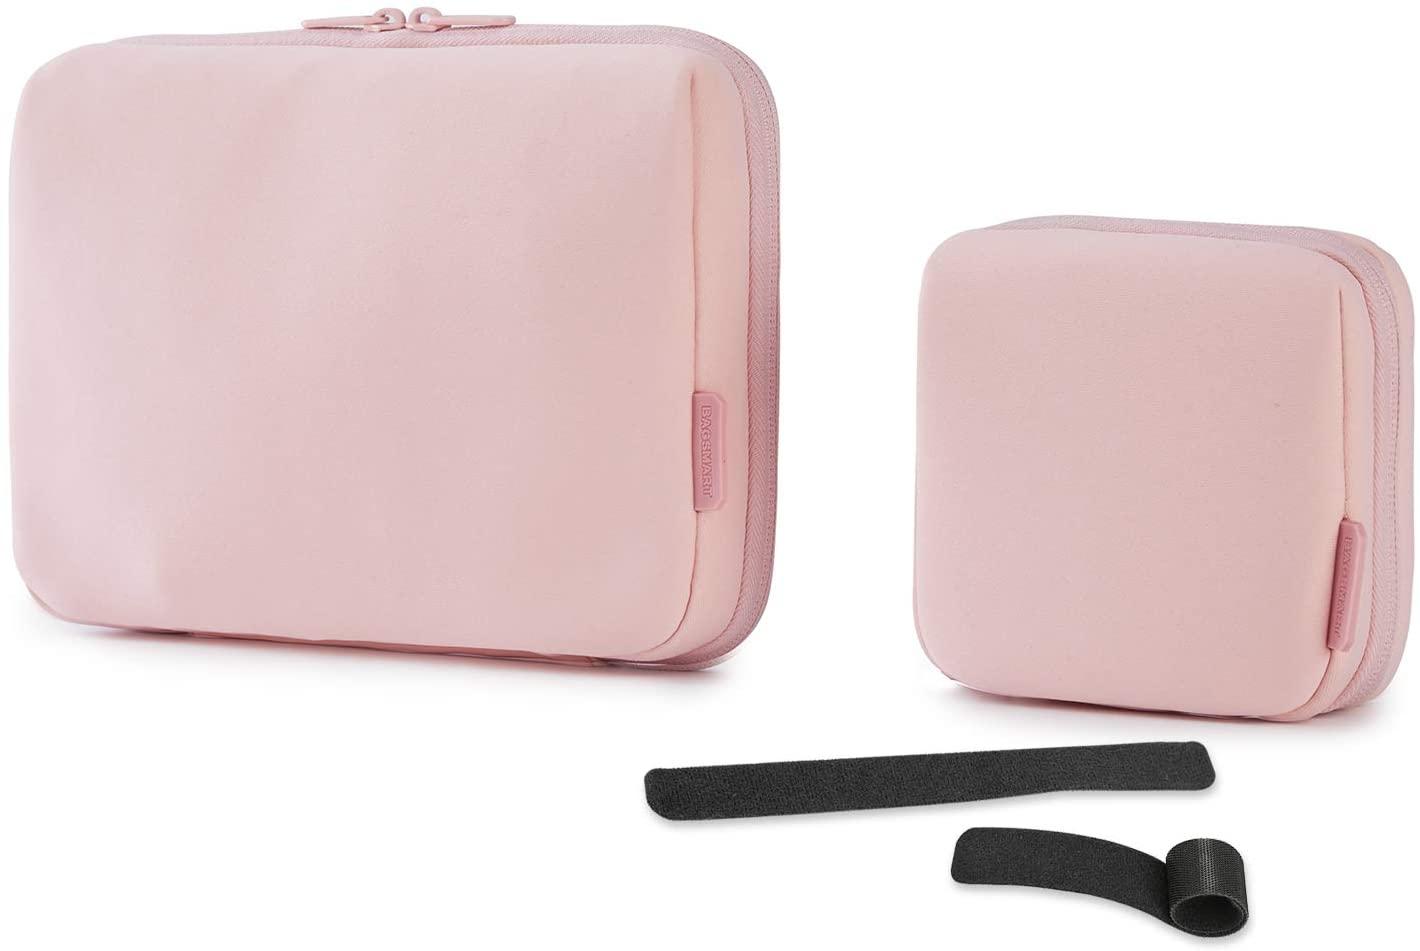 BAGSMART 케이블 전자 오거나이저 2PCS 여행 포장 가제트 가방 주머니 용 7.9 인치 아이 패드 케이블 마우스 전화 USB SD 카드 (핑크)